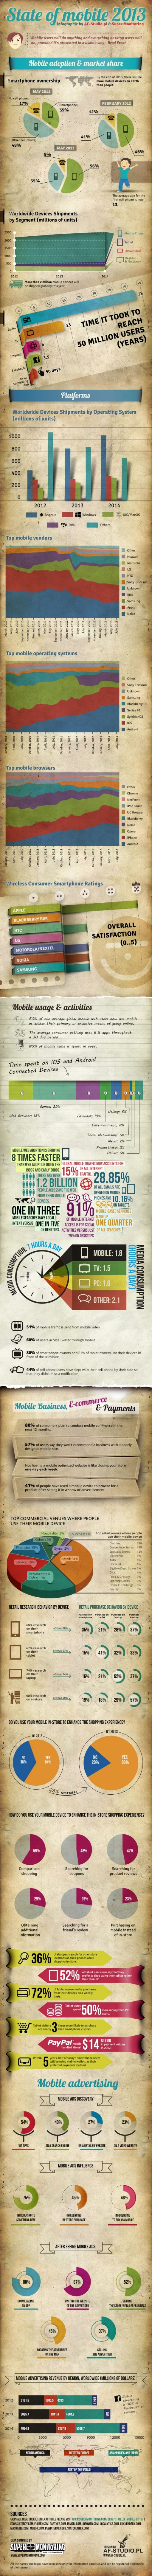 inforgraphic-mobile